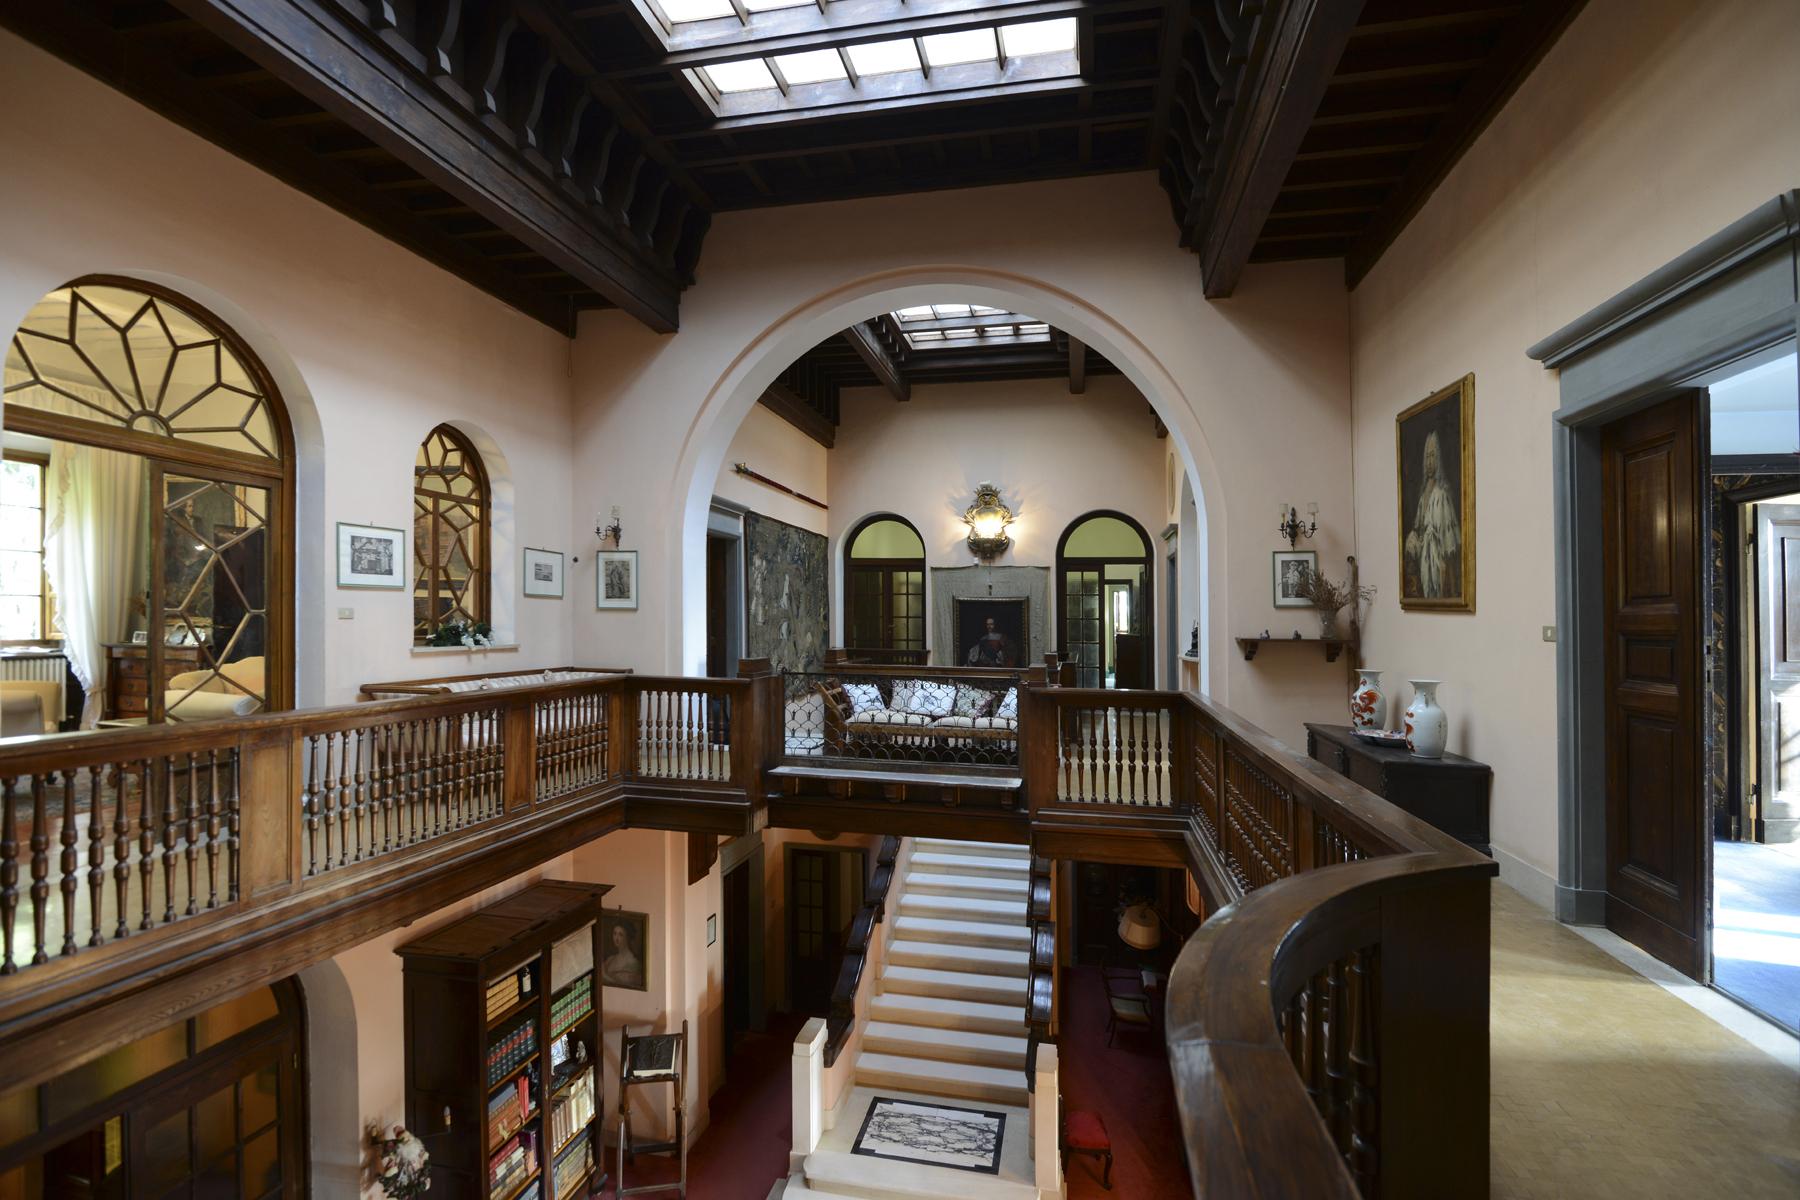 Villa in Vendita a Casciana Terme Lari: 5 locali, 1800 mq - Foto 19